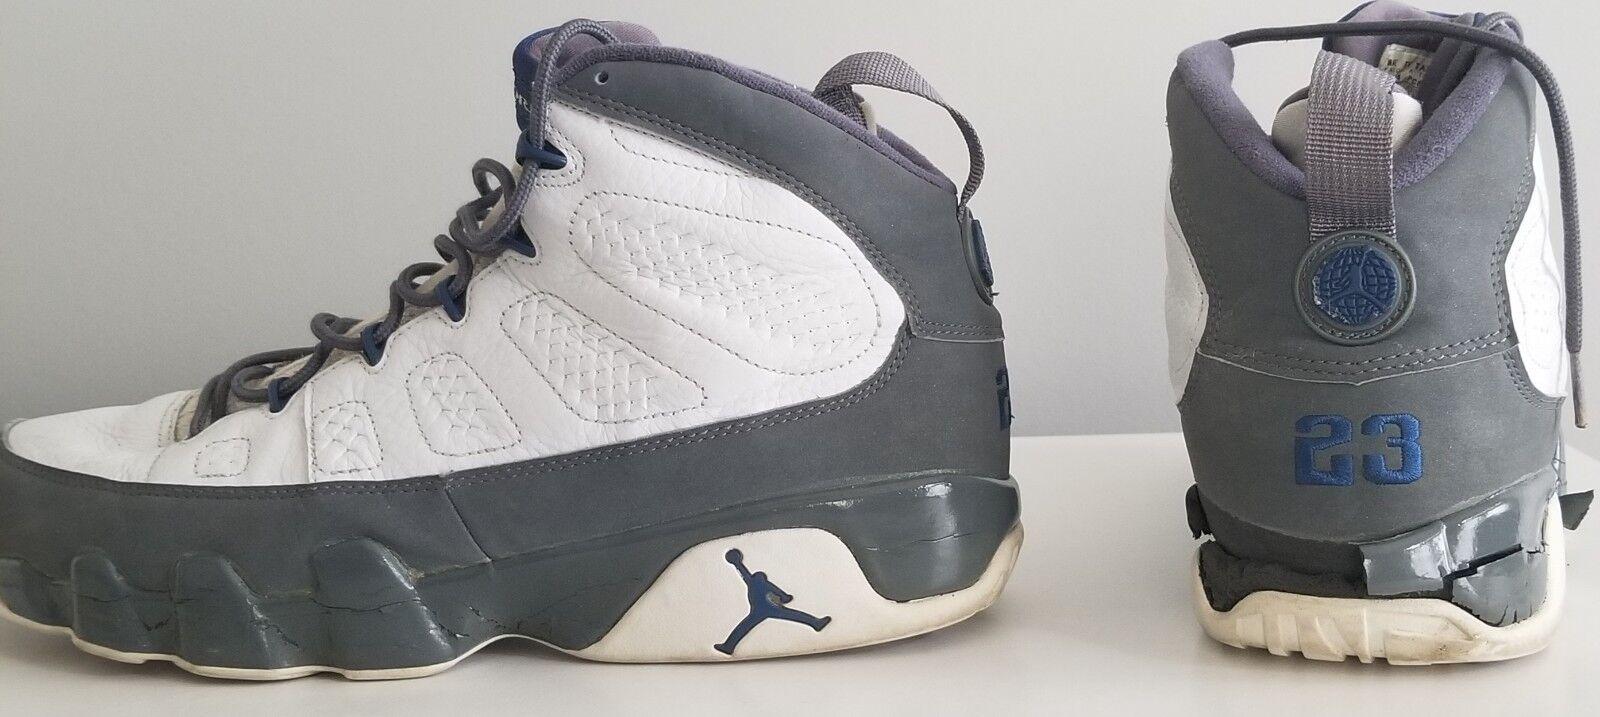 Air Jordan 9 Wolf grau Größe 14